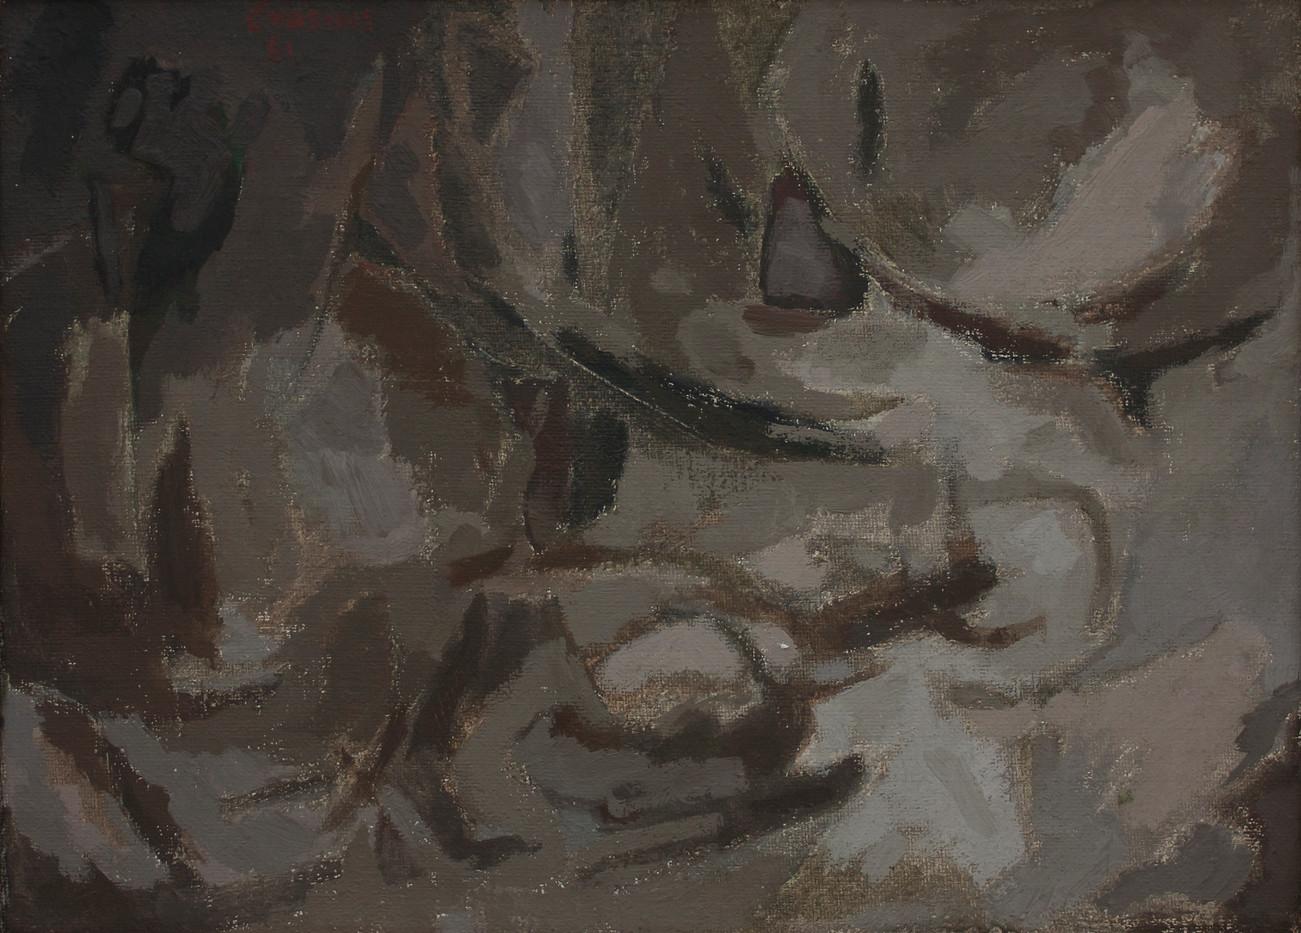 Nel Erasmus | Untitled | 1961 | Oil on Canvas | 33.5 x 46.5 cm